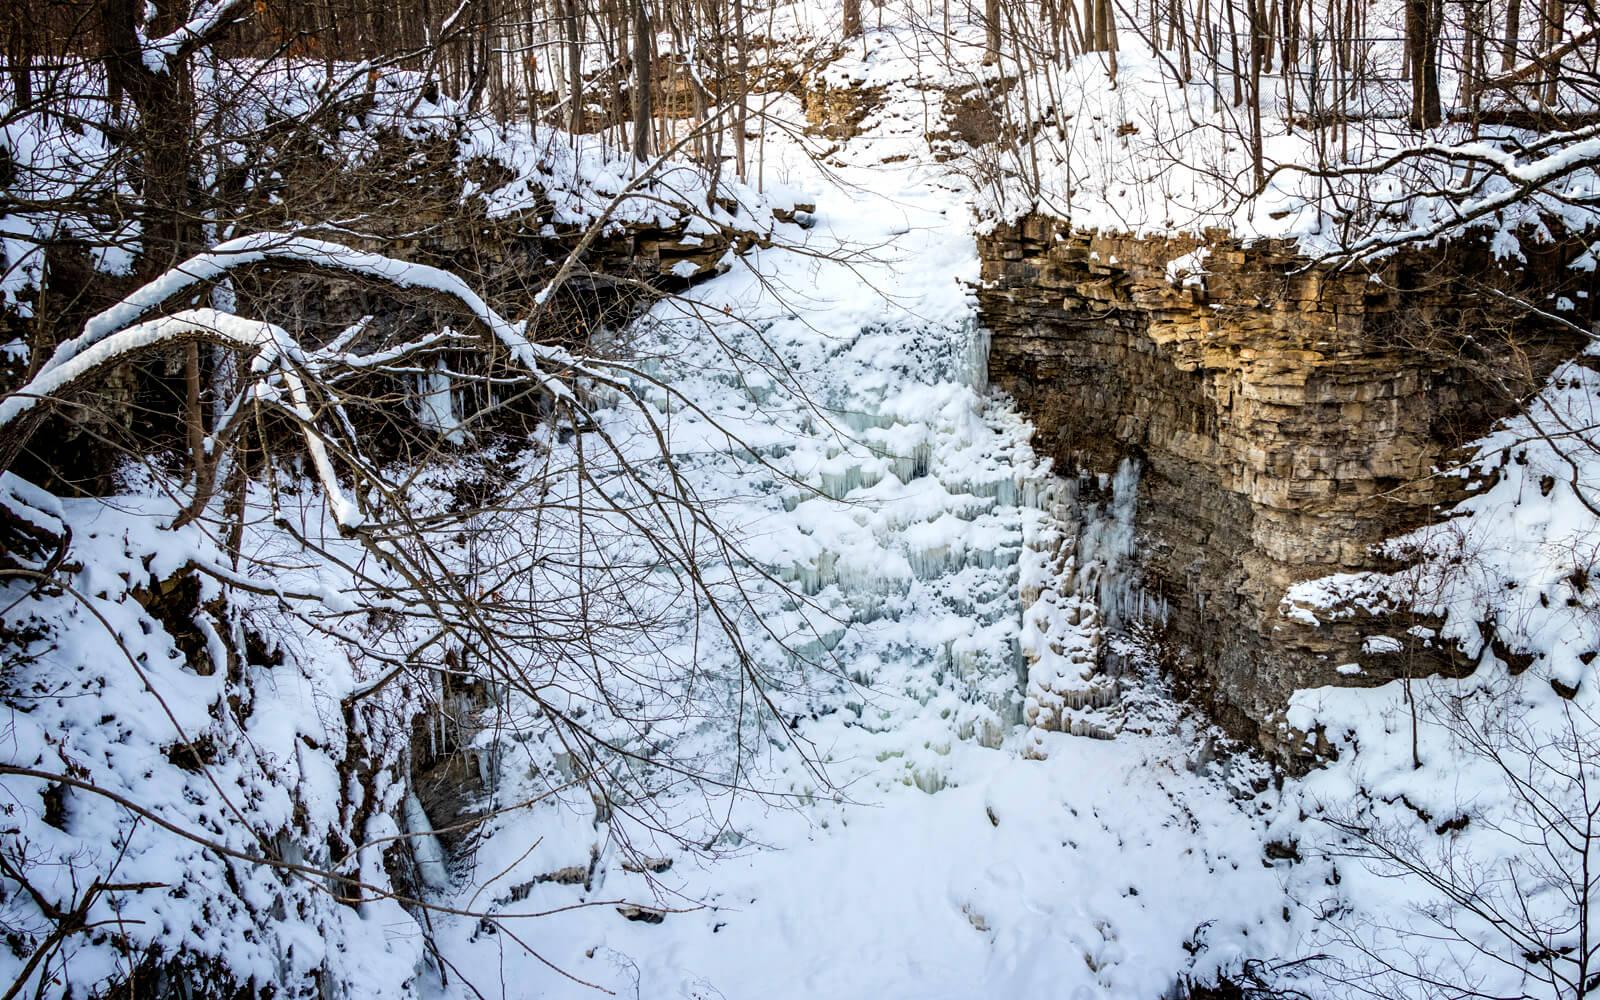 Winter Views of Swayze Falls in Short Hills Provincial Park :: I've Been Bit! Travel Blog